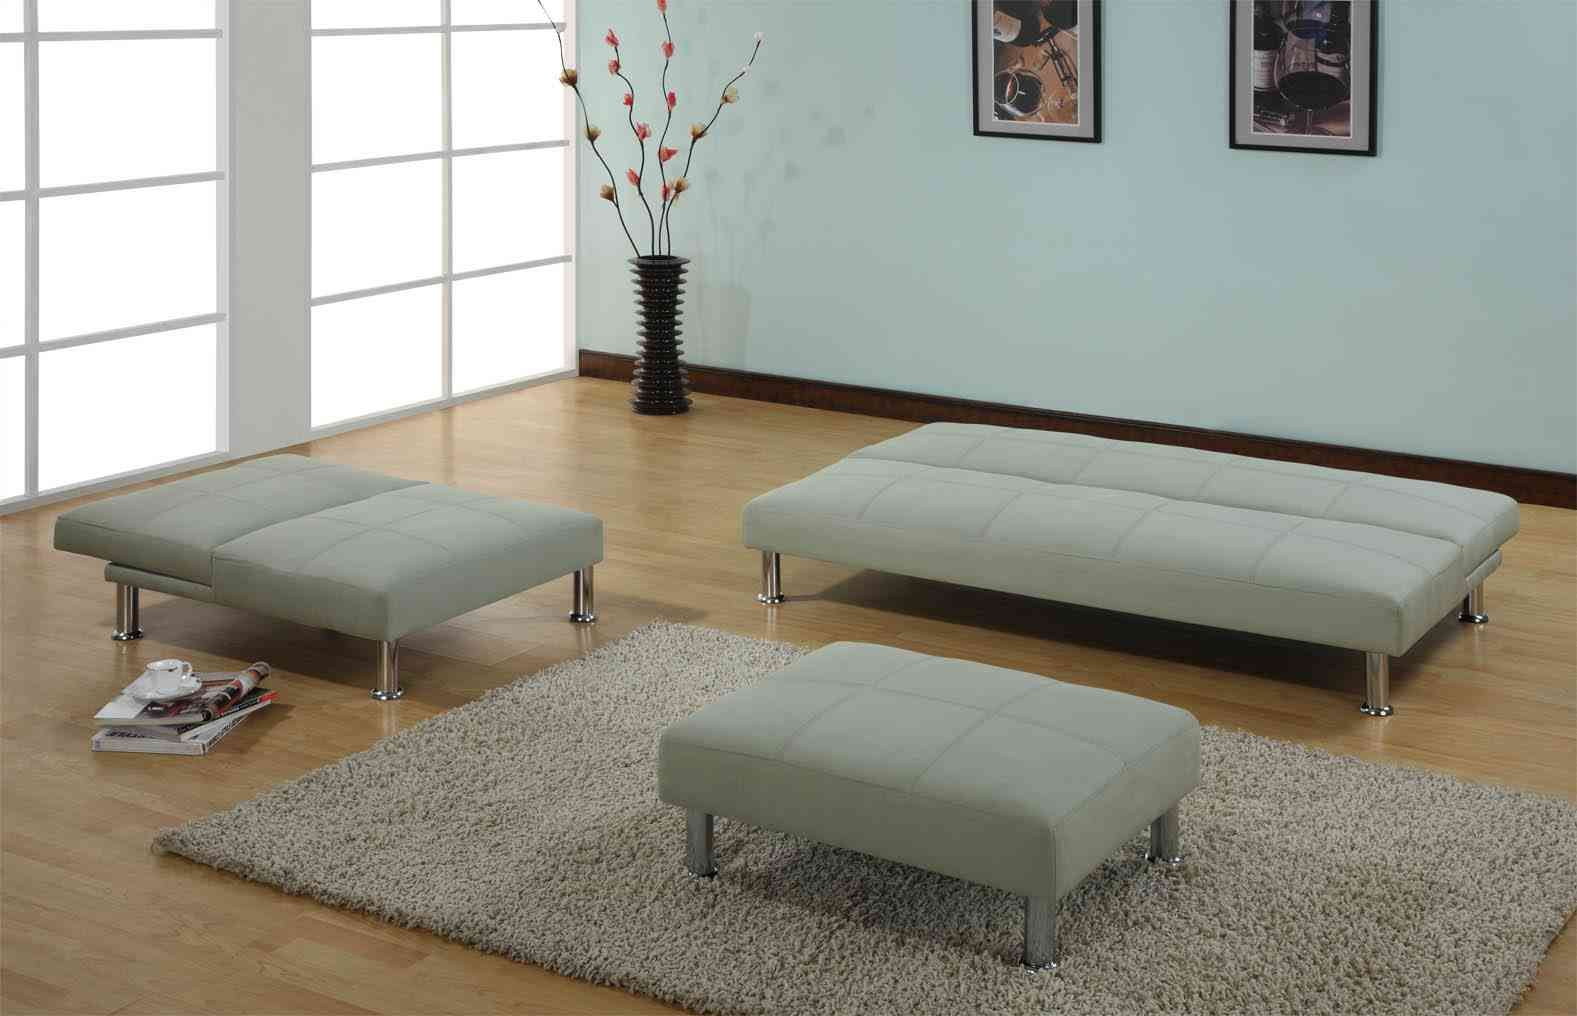 Original Ikea Sleeper Sofa Chair Natural Postadsukcom Now Claimed ...